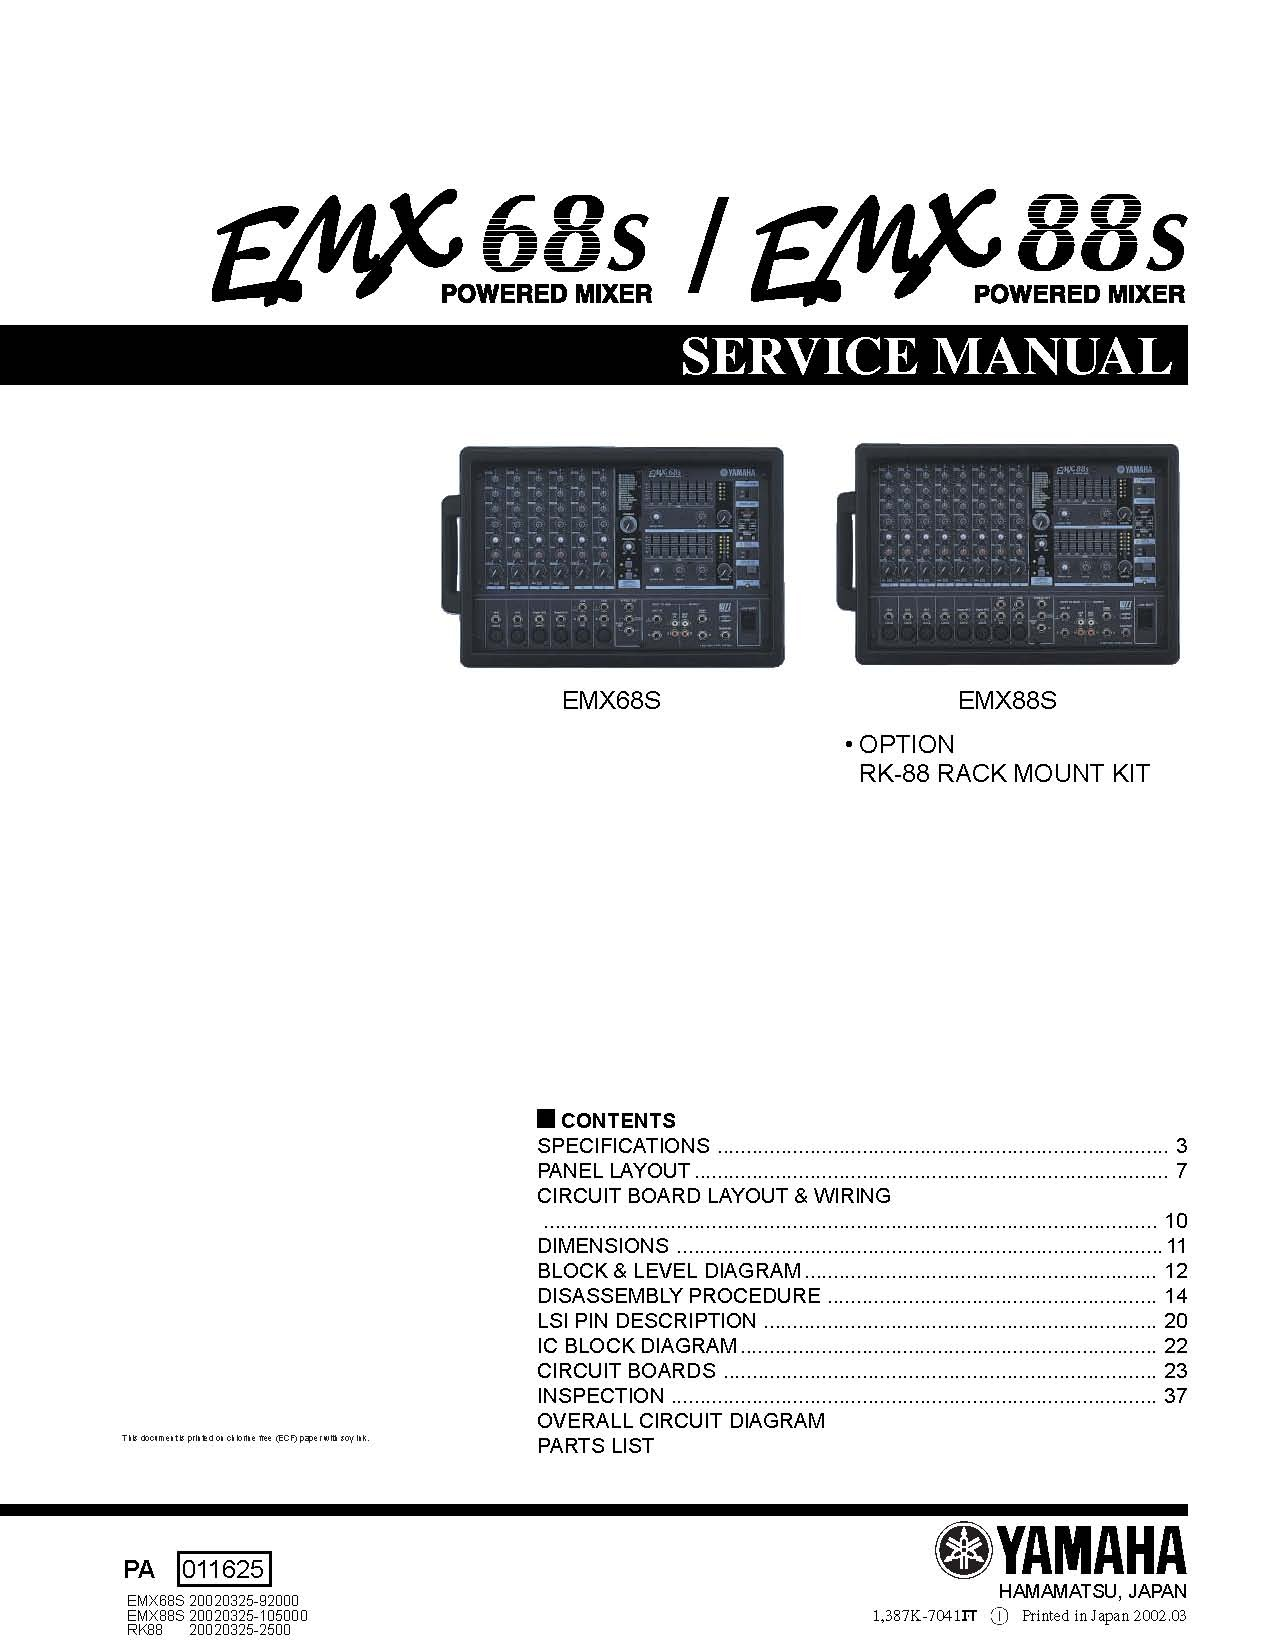 8 Array - yamaha emx640 service manual music manuals rh sellfy com